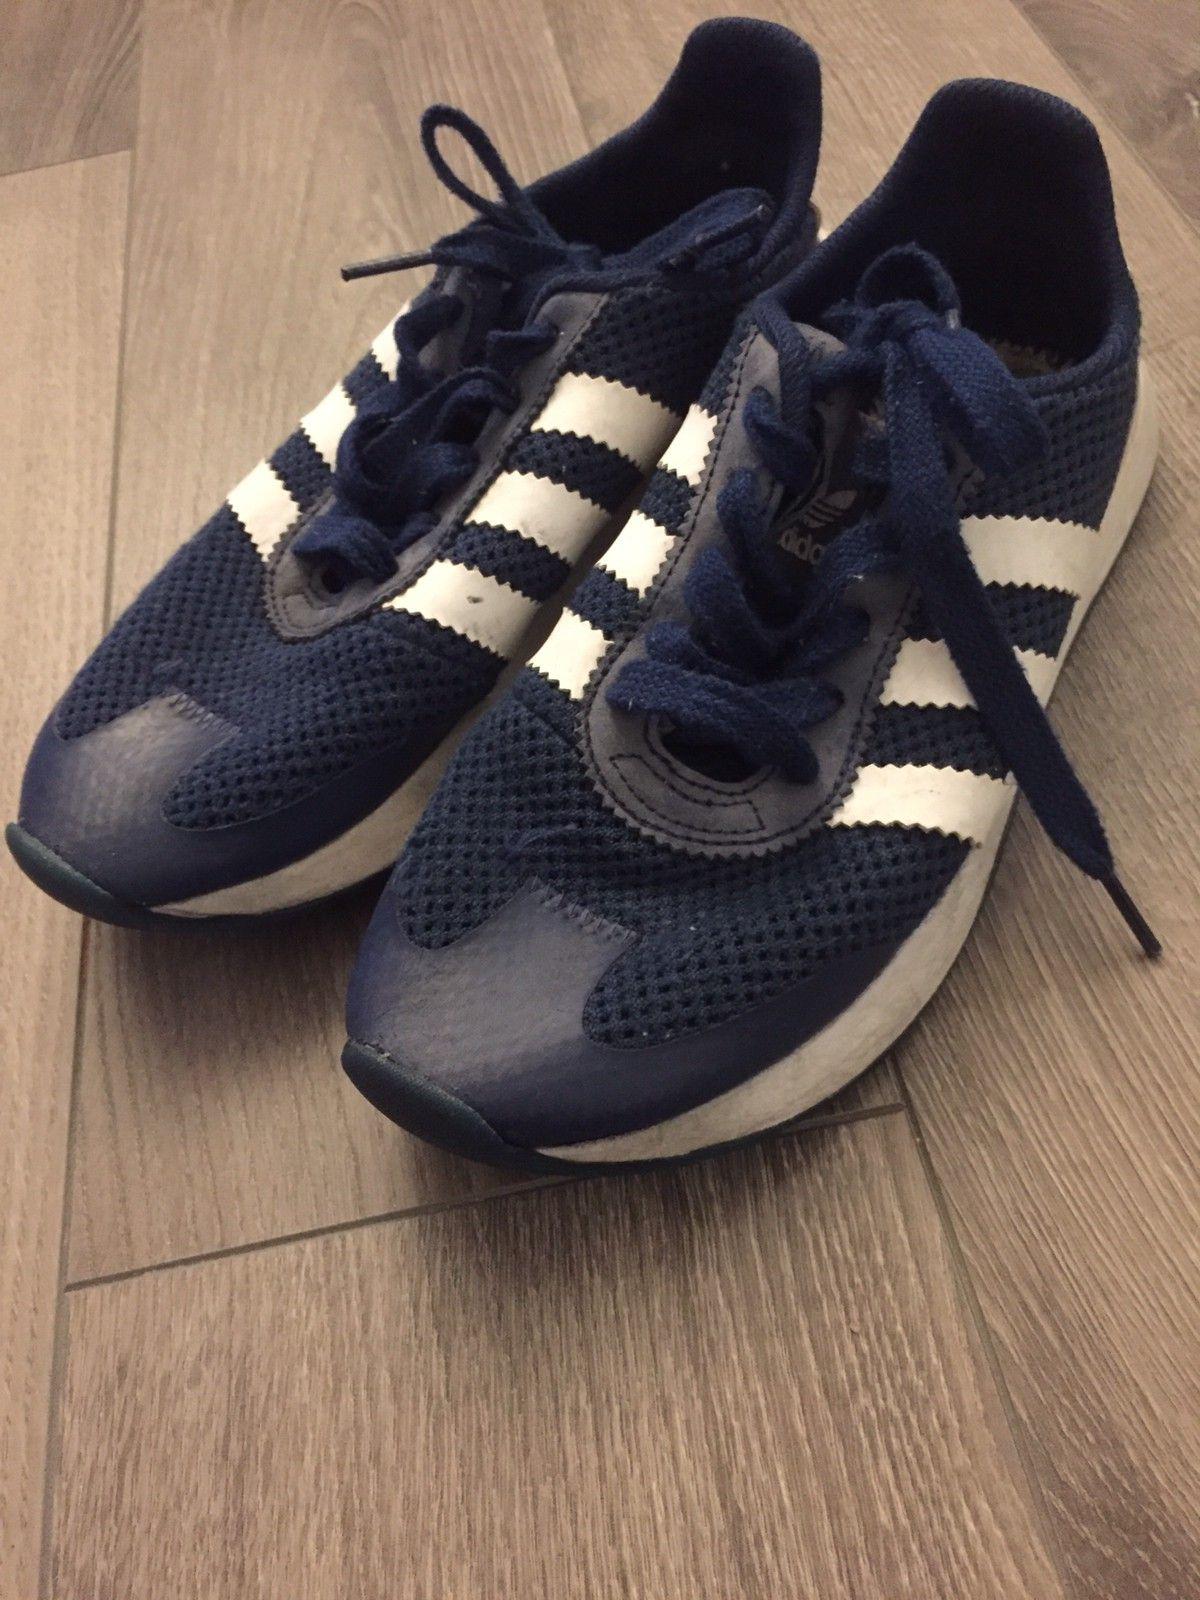 Adidas joggesko str 37 13 | FINN.no